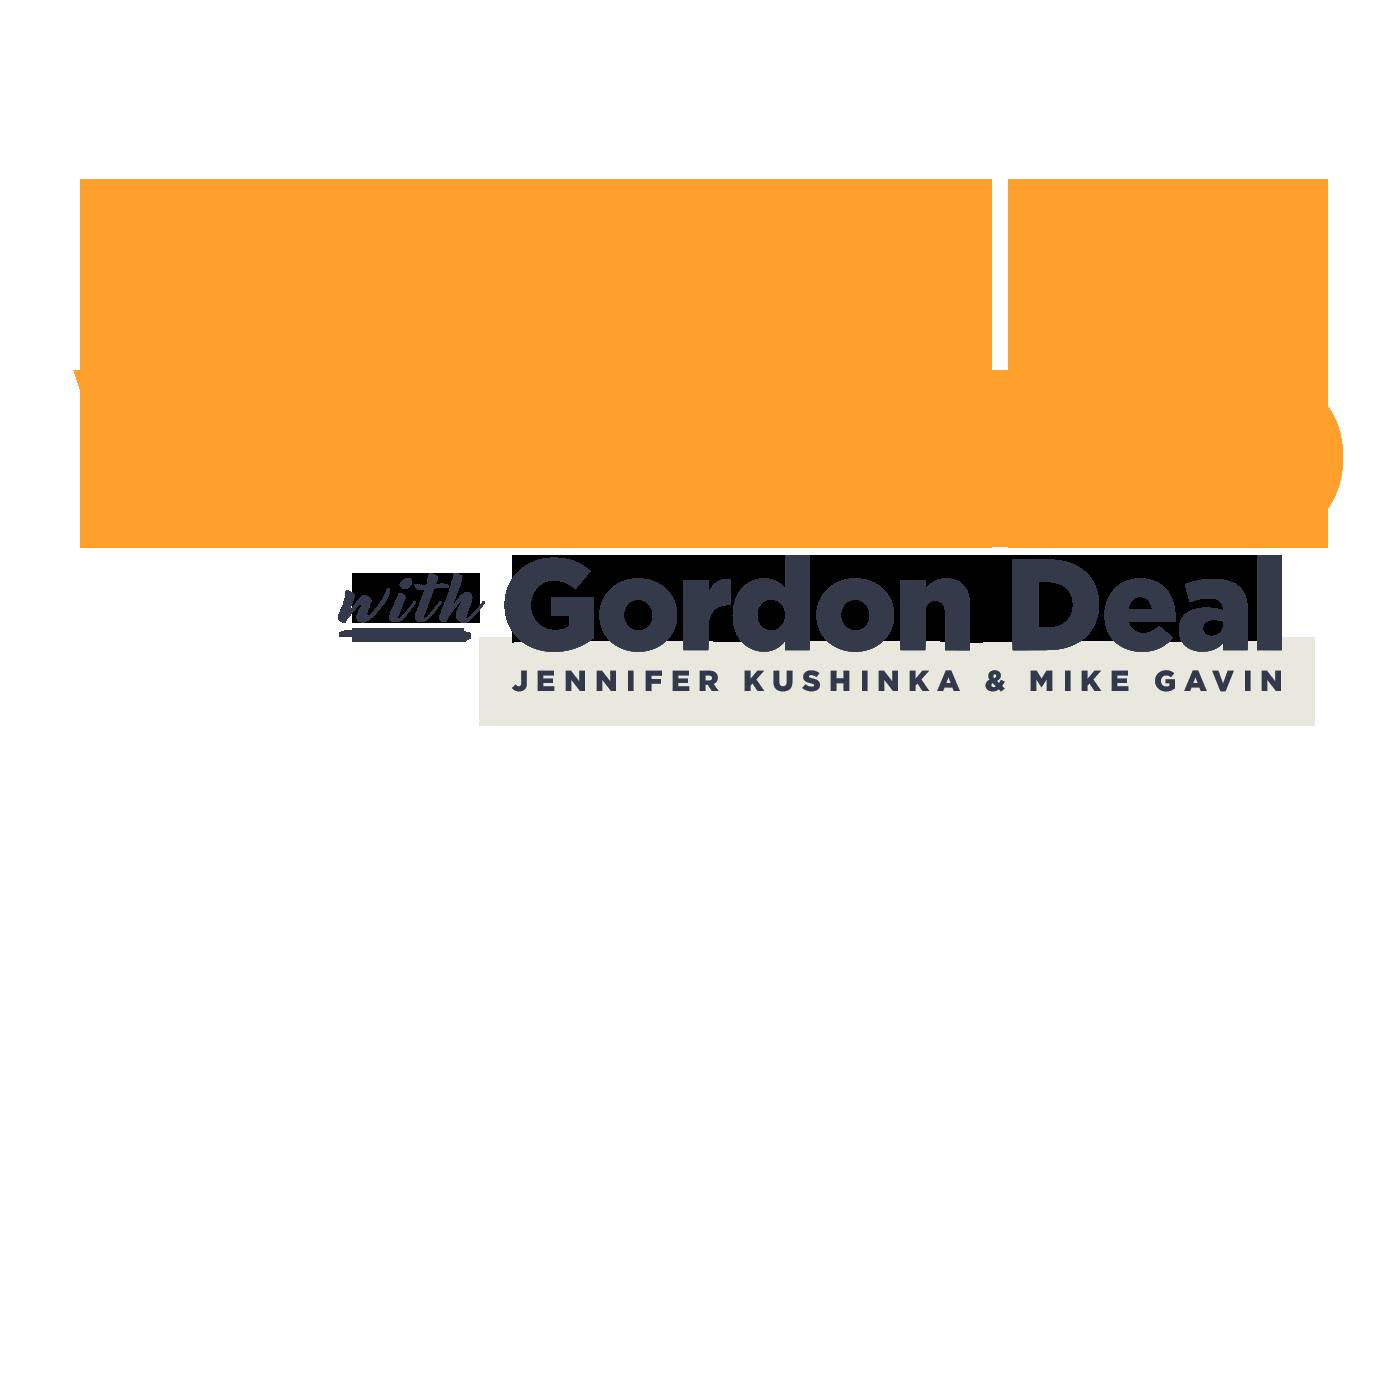 TwGD-OnDemand2017-1400x1400c